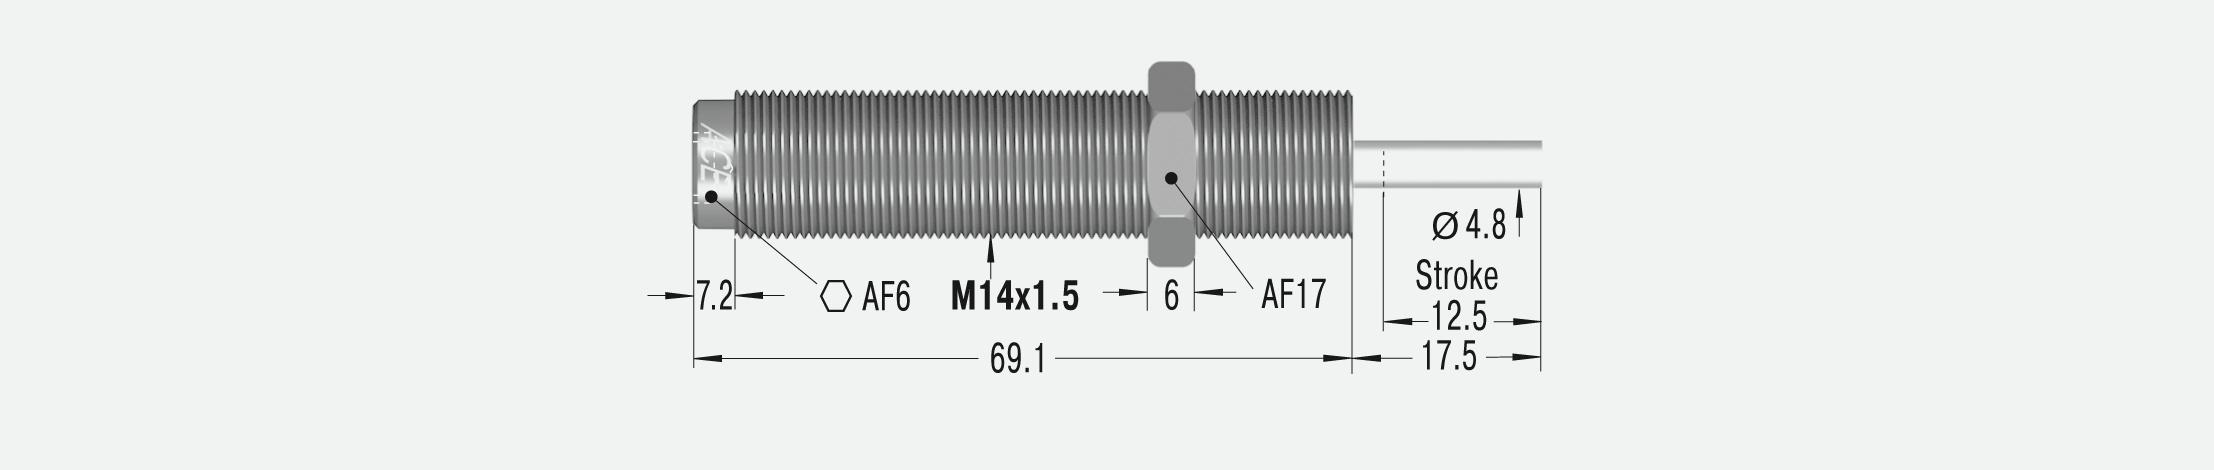 MC150MH-V4A